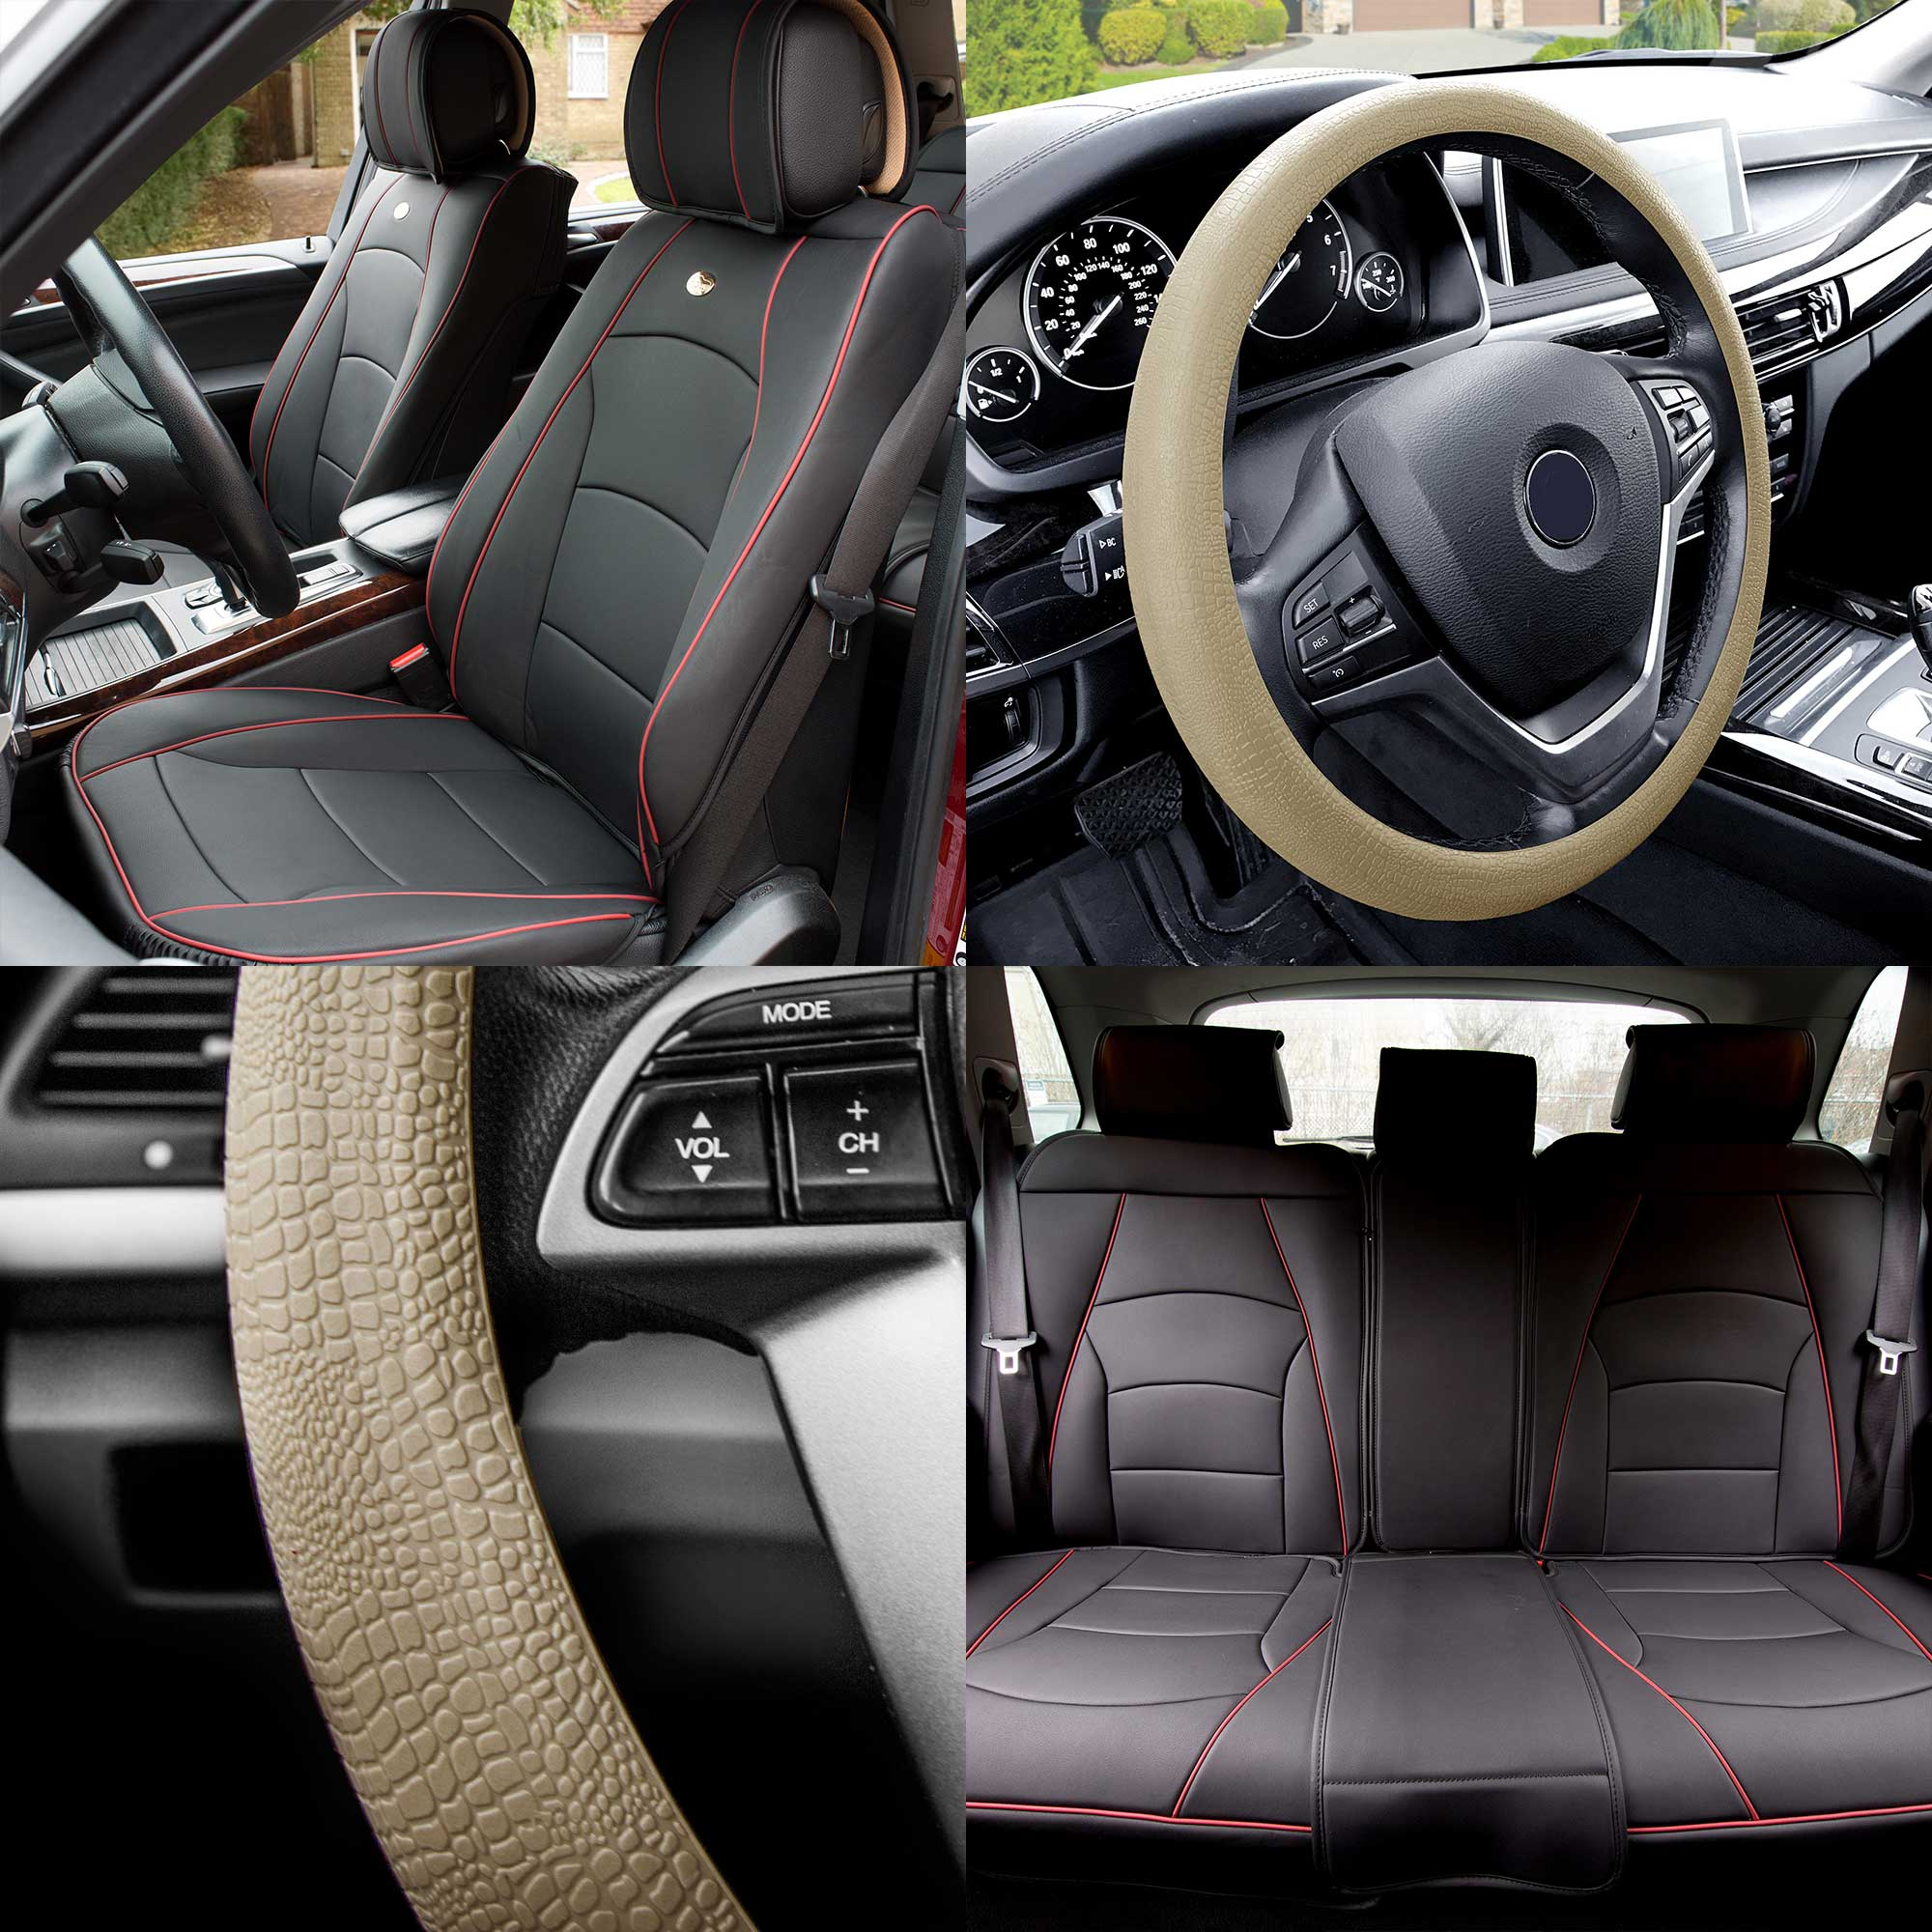 Car Seat Cover PU Leather 5 Seats Full Set Black Red W Beige